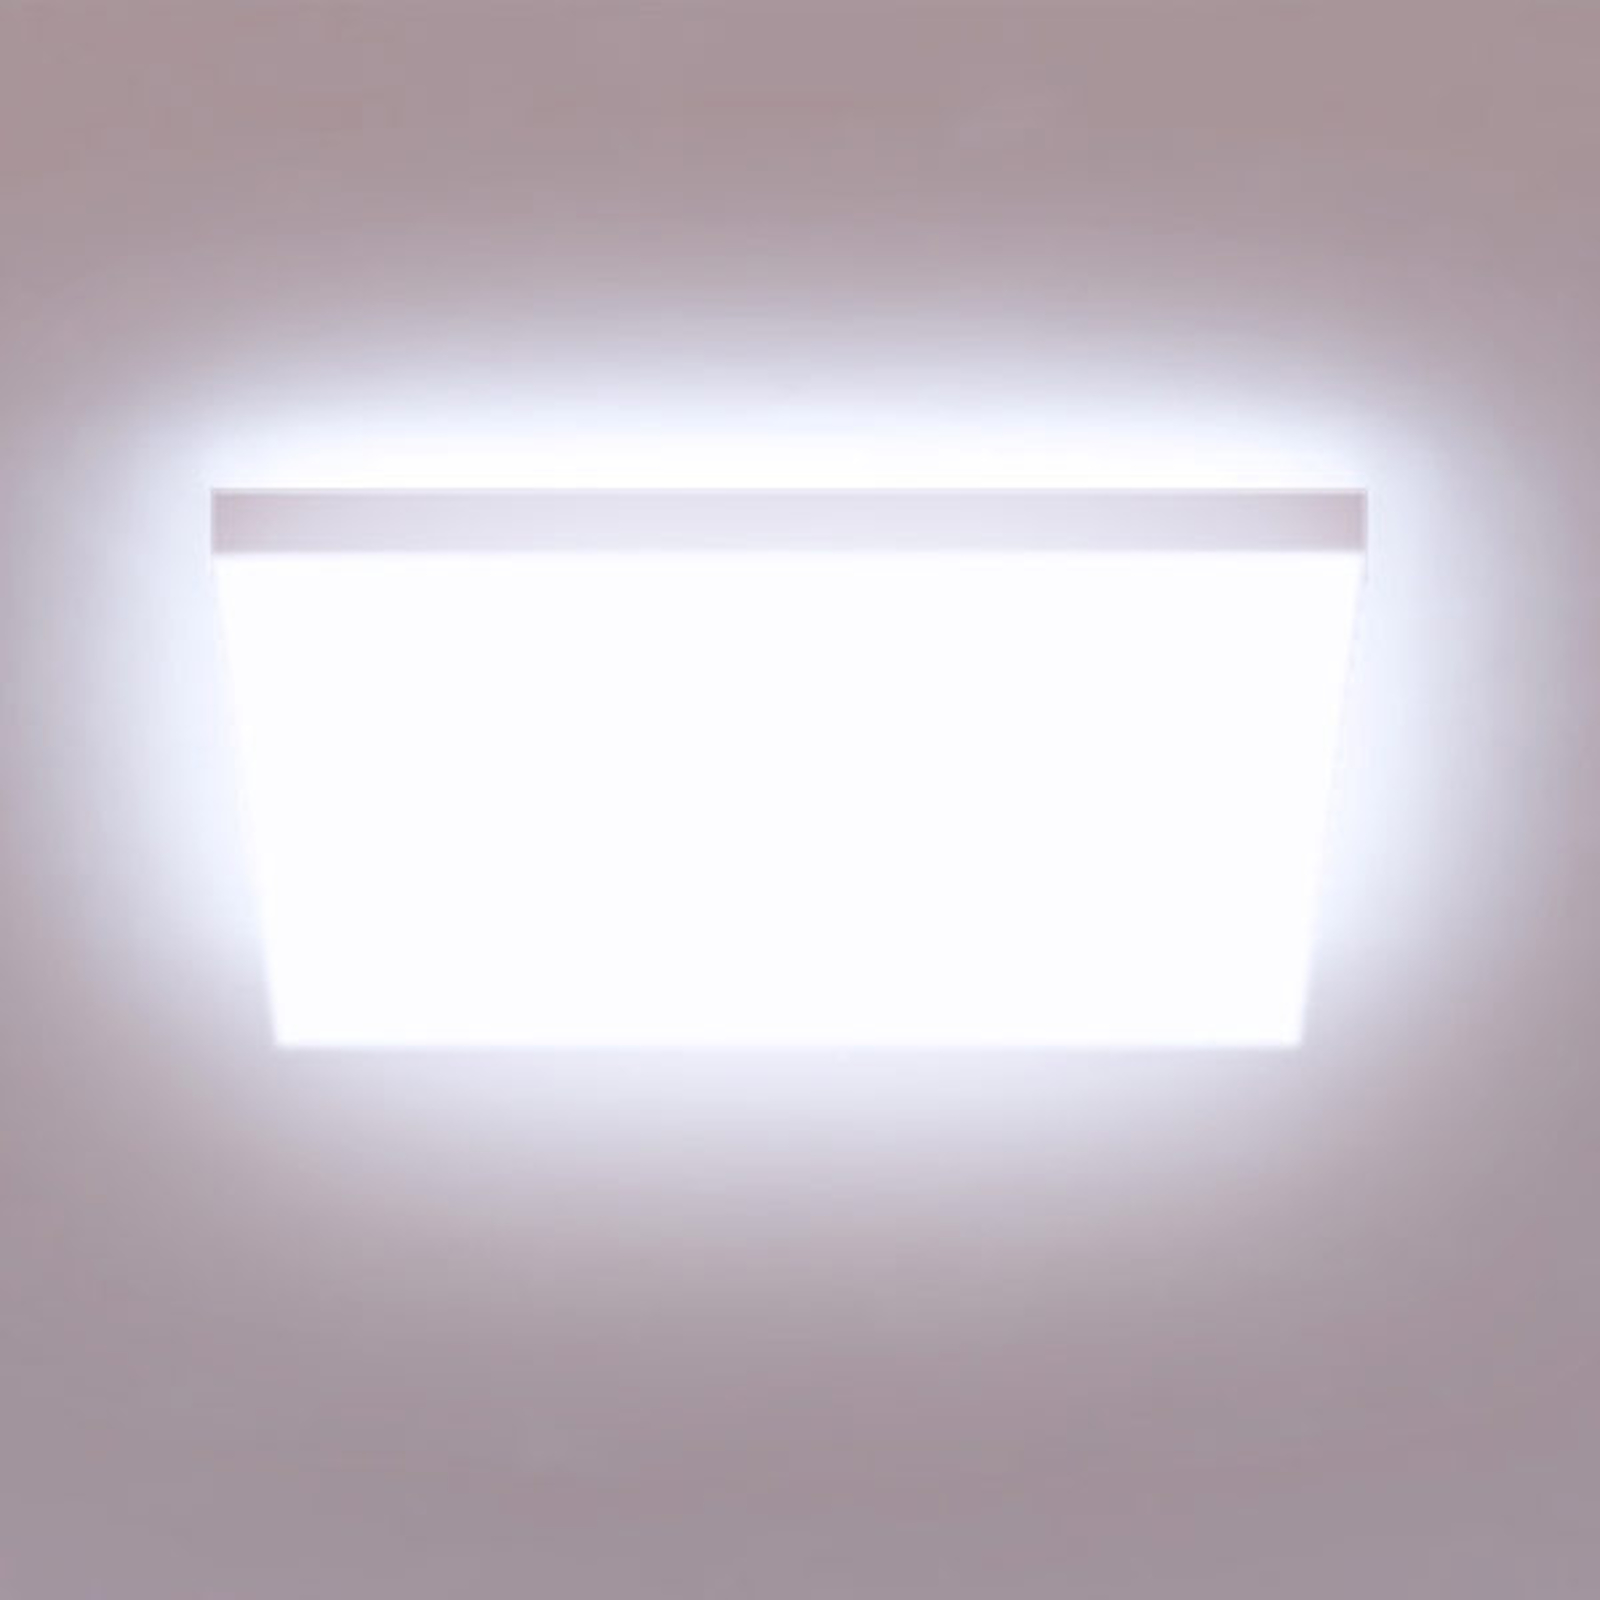 Müller Licht tint LED-panel Loris, 45x45cm